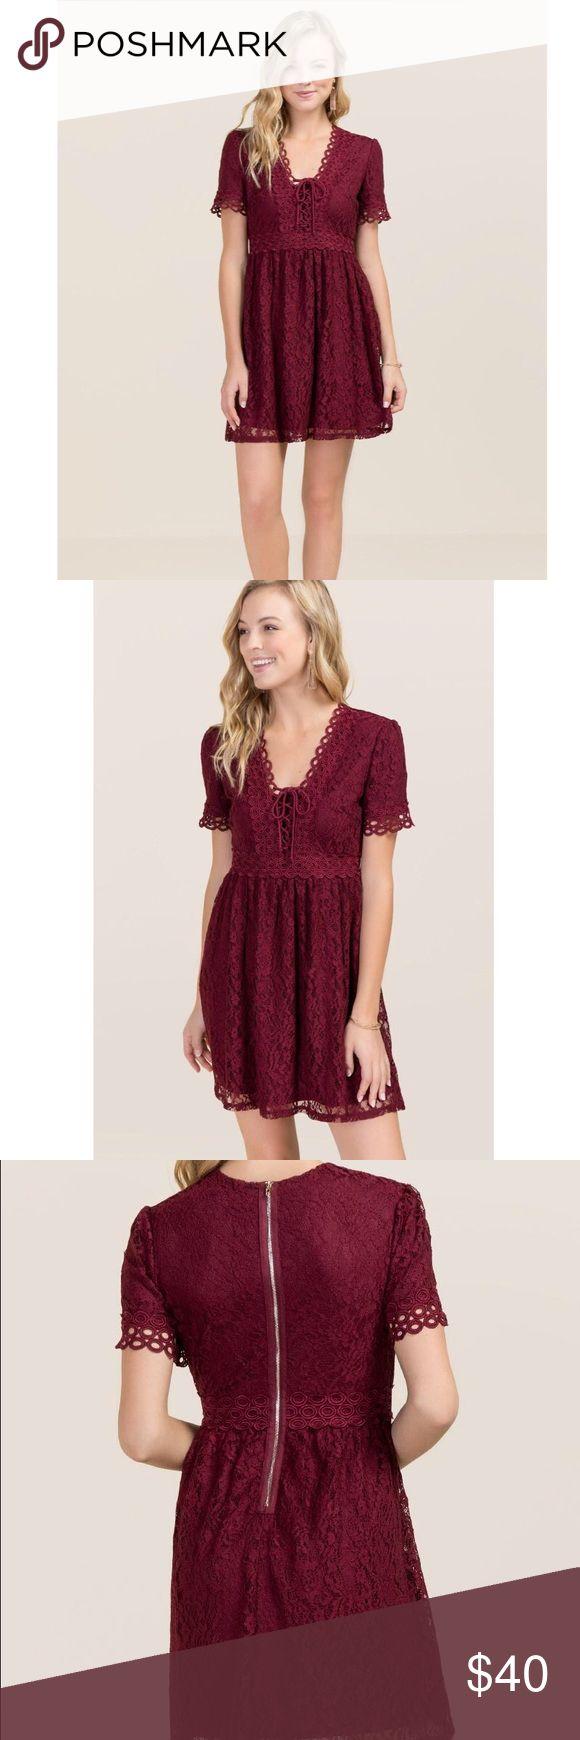 Francesca's wine lace up dress NWT Francesca's wine colored crochet lace up dress. Zips up back. Size XS Francesca's Collections Dresses Mini